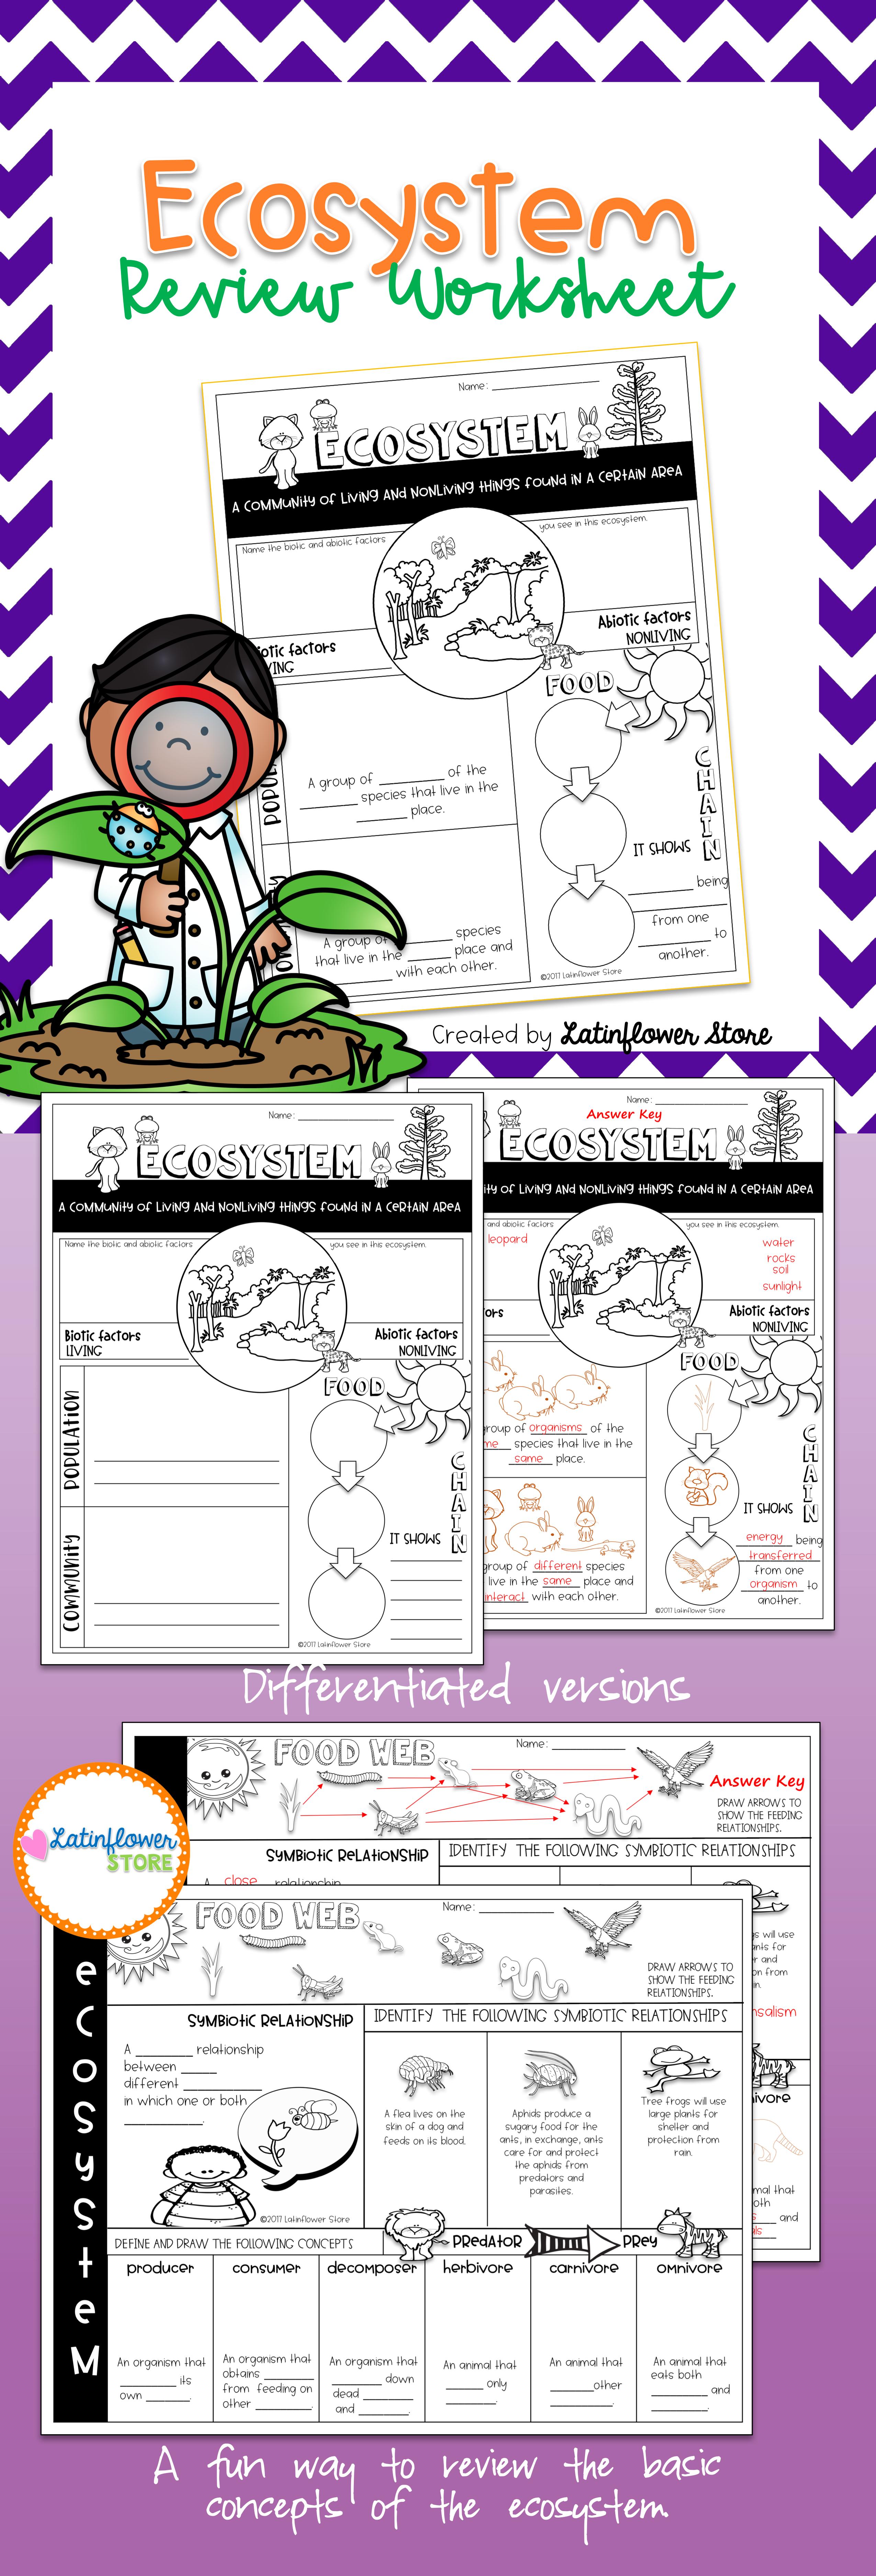 Worksheets Ecosystem Worksheet ecosystem review worksheet worksheets food webs and chains worksheet